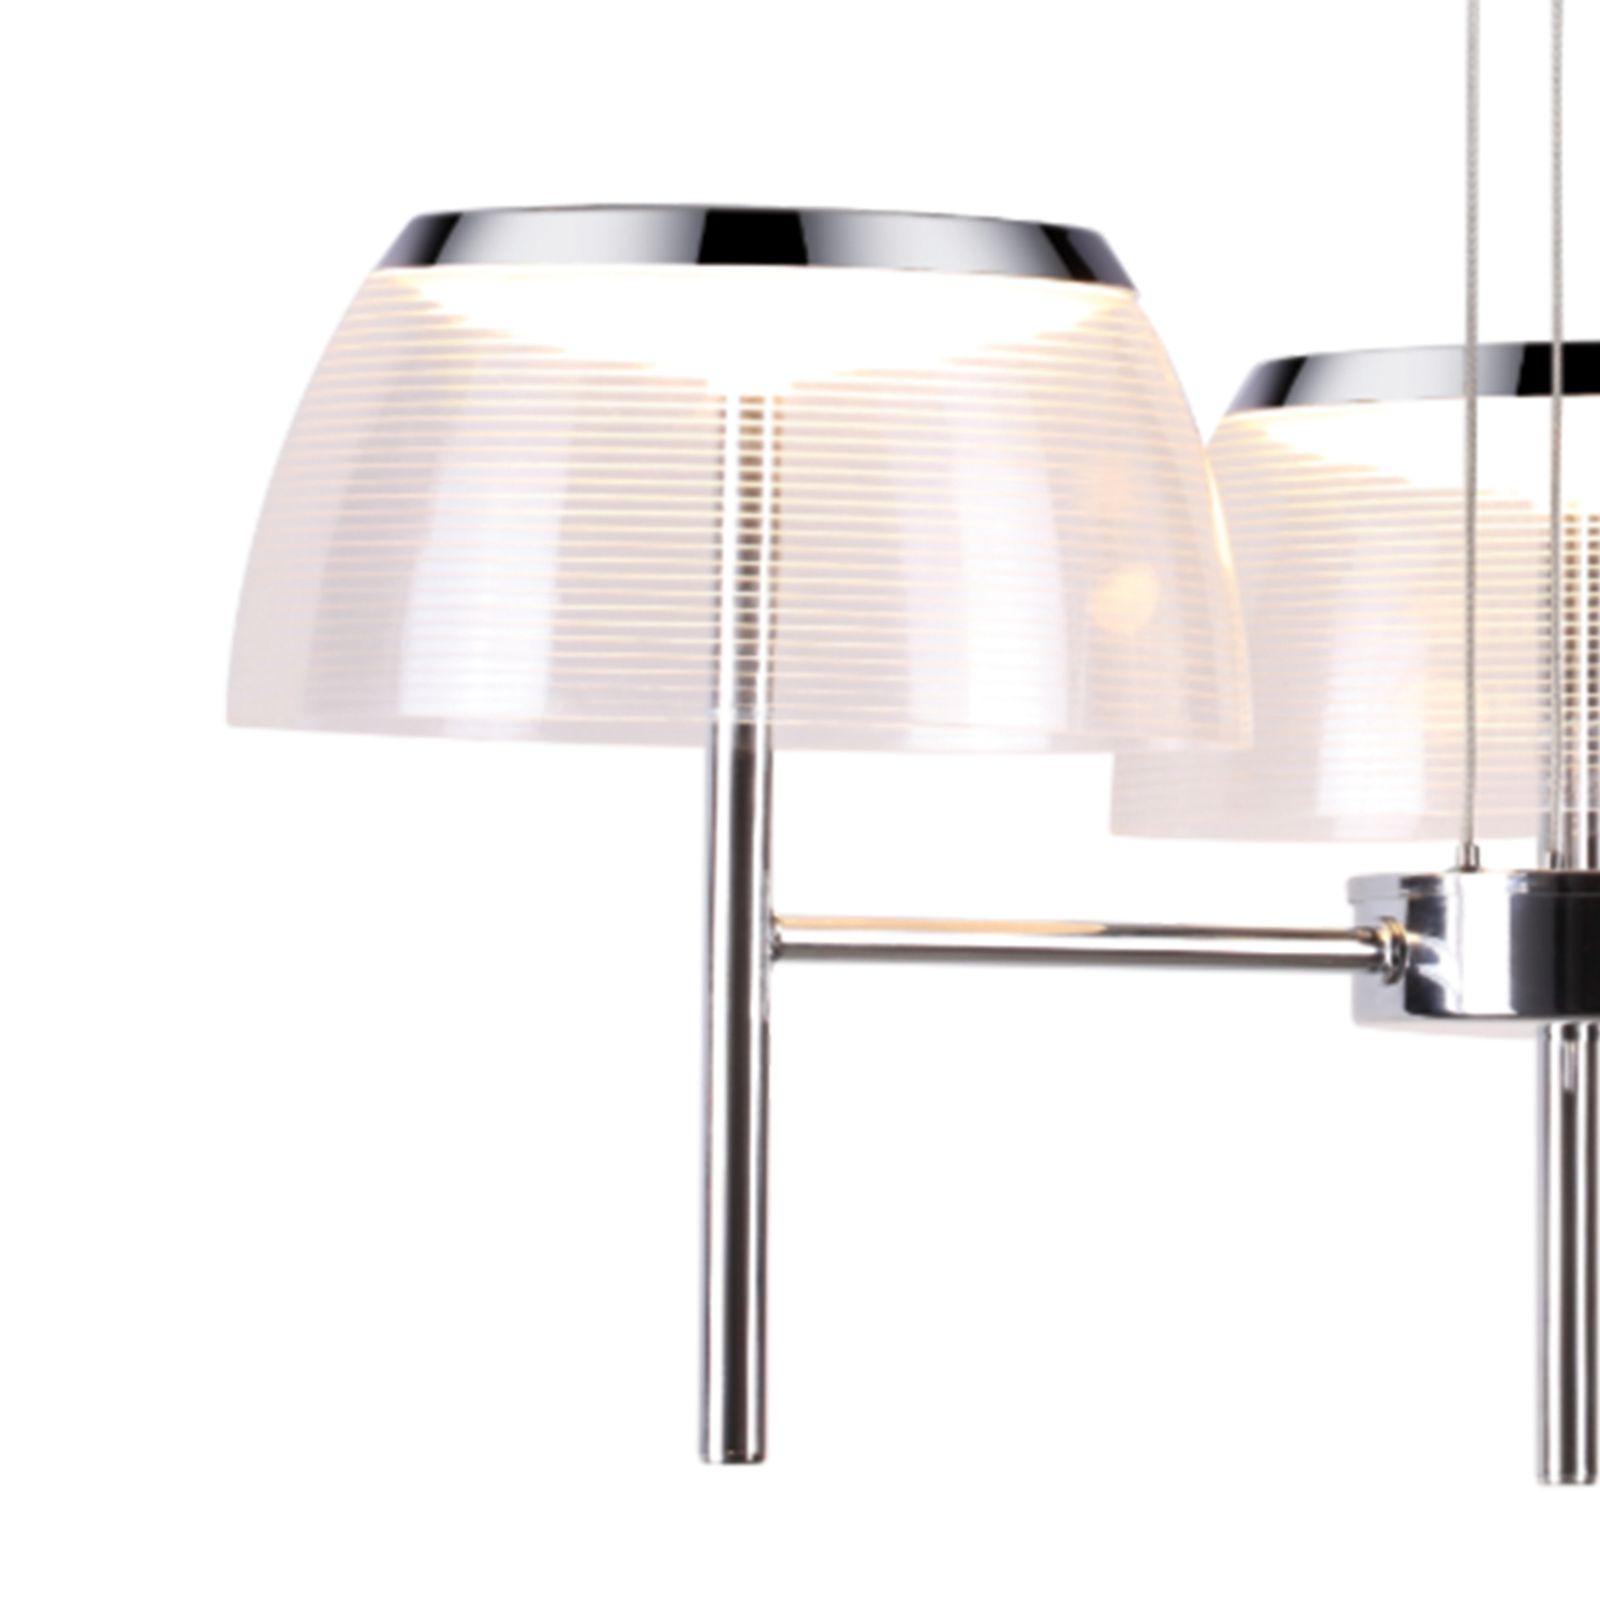 led pendelleuchte 3 flammig 3 fach seilabh ngung chrom 81229. Black Bedroom Furniture Sets. Home Design Ideas